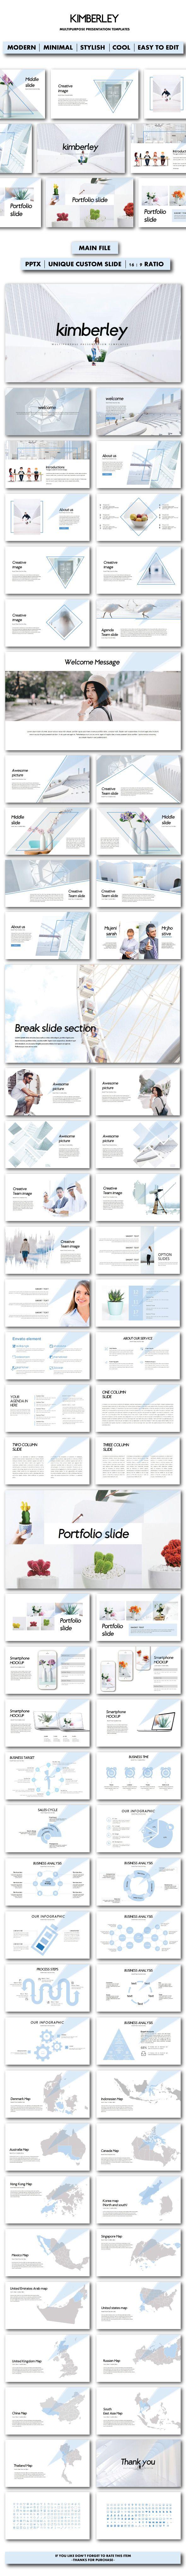 Kimberley Multipurpose Templates - PowerPoint Templates Presentation Templates